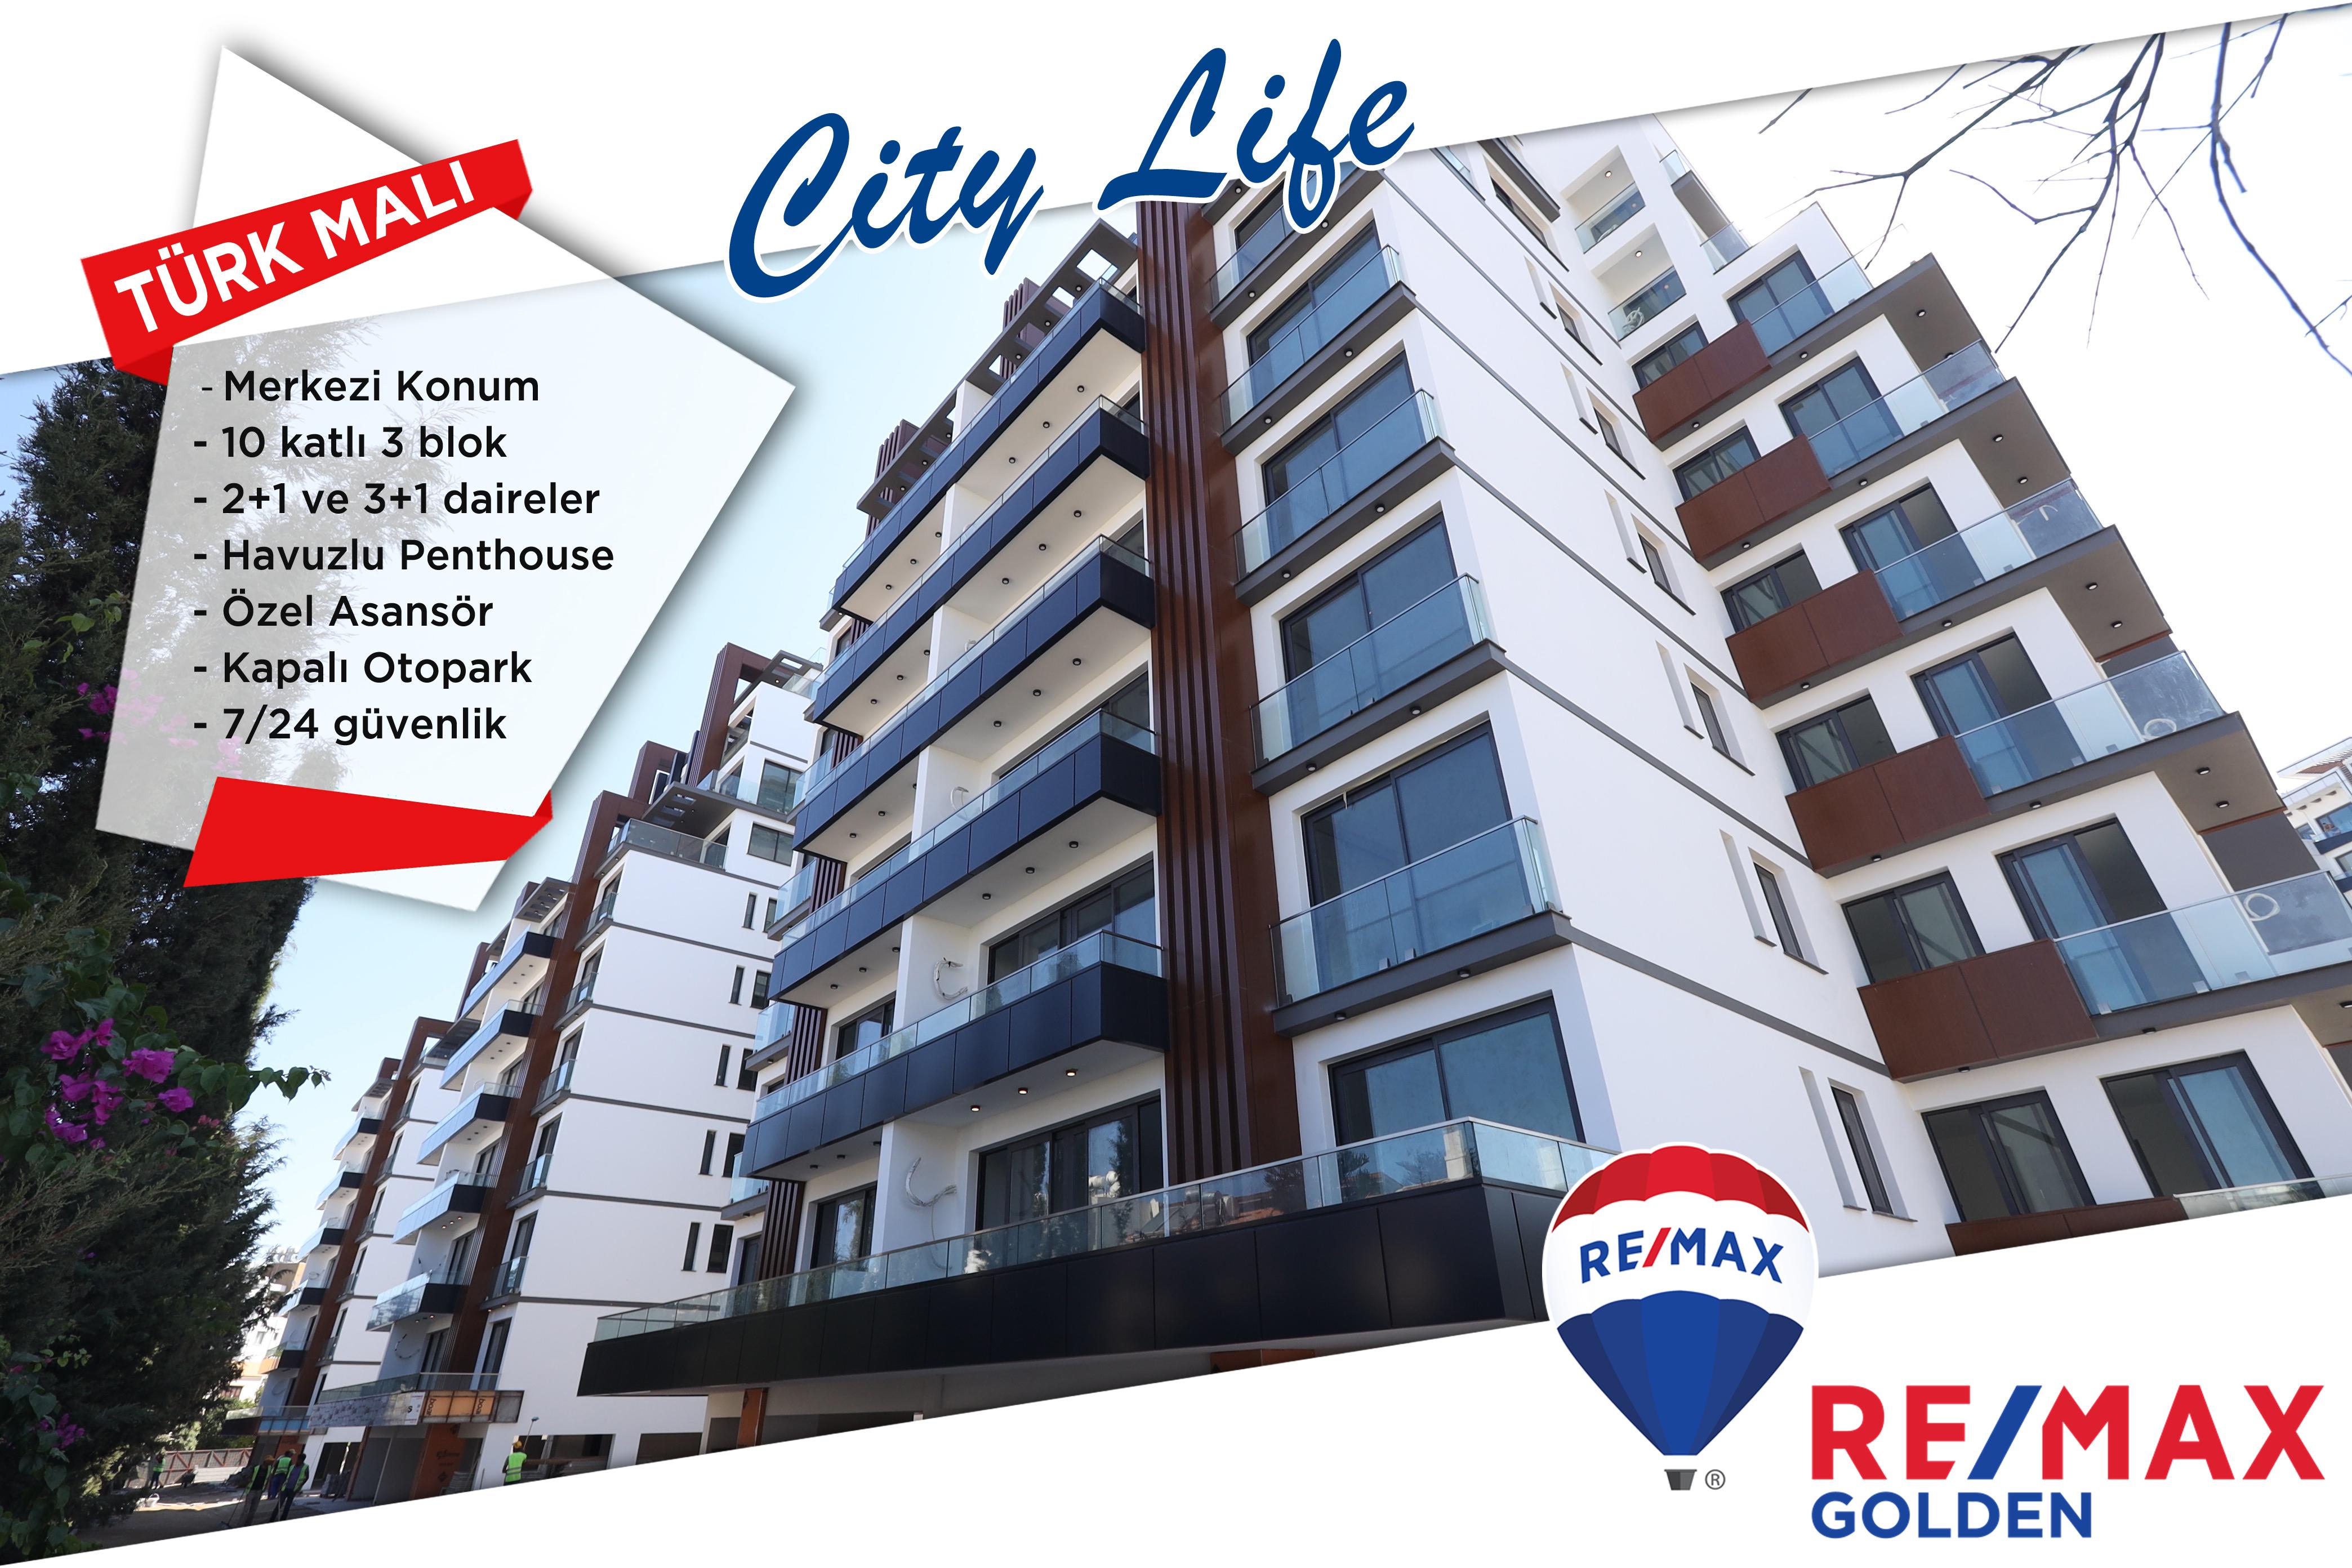 City Life Remax Golden Cyprus